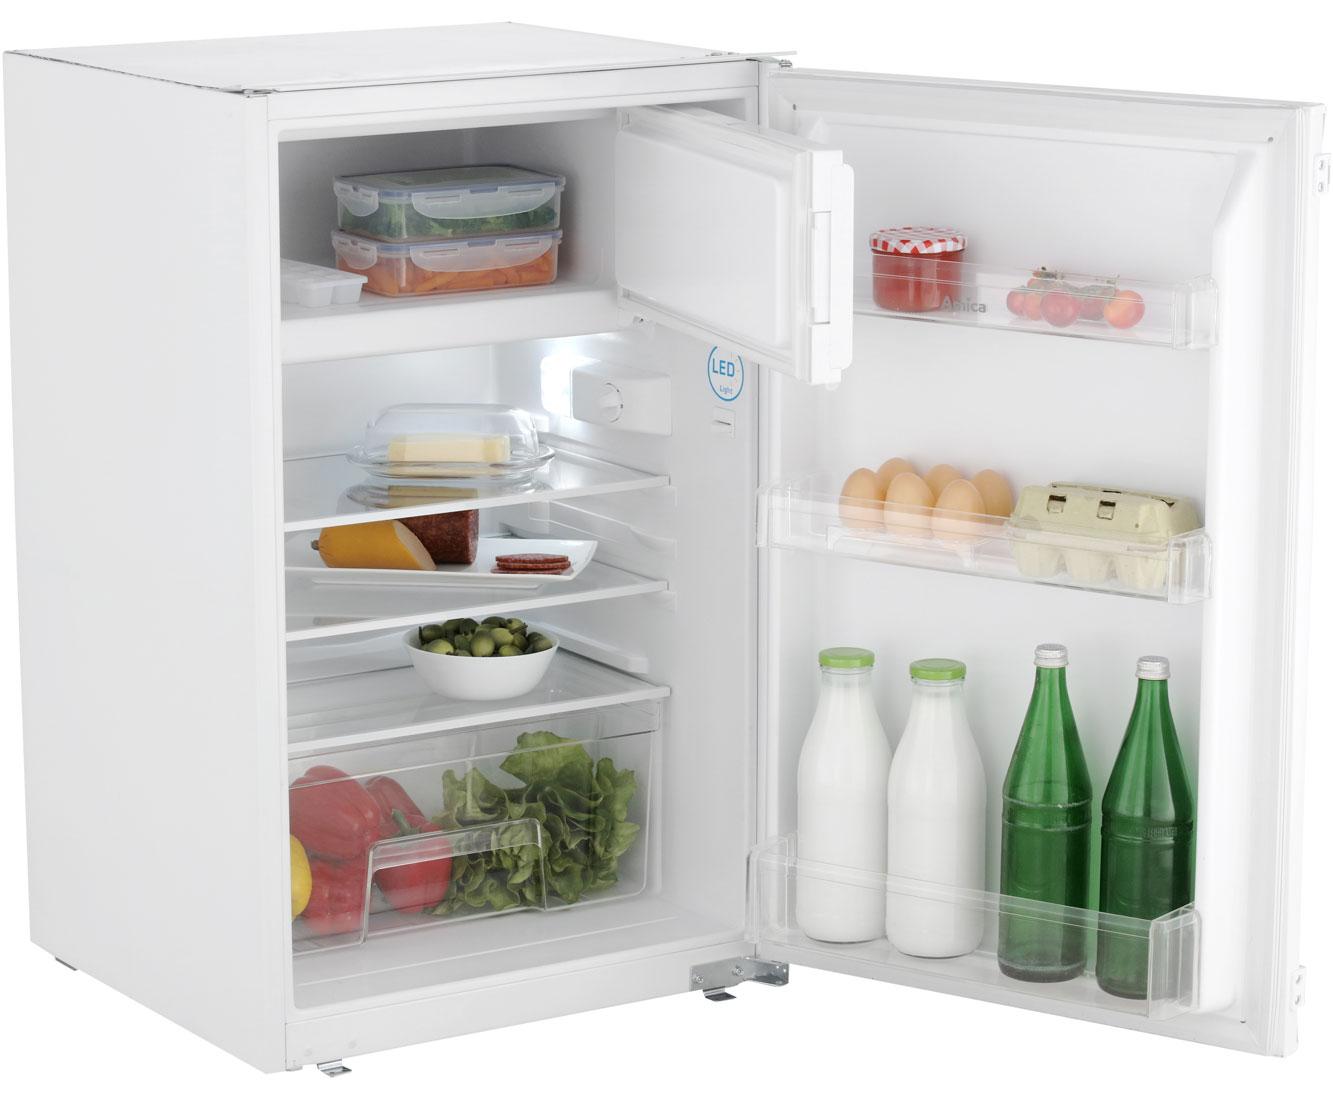 Amica Kühlschrank A : Amica eks 16161 kühlschrank eingebaut 54cm weiß neu ebay